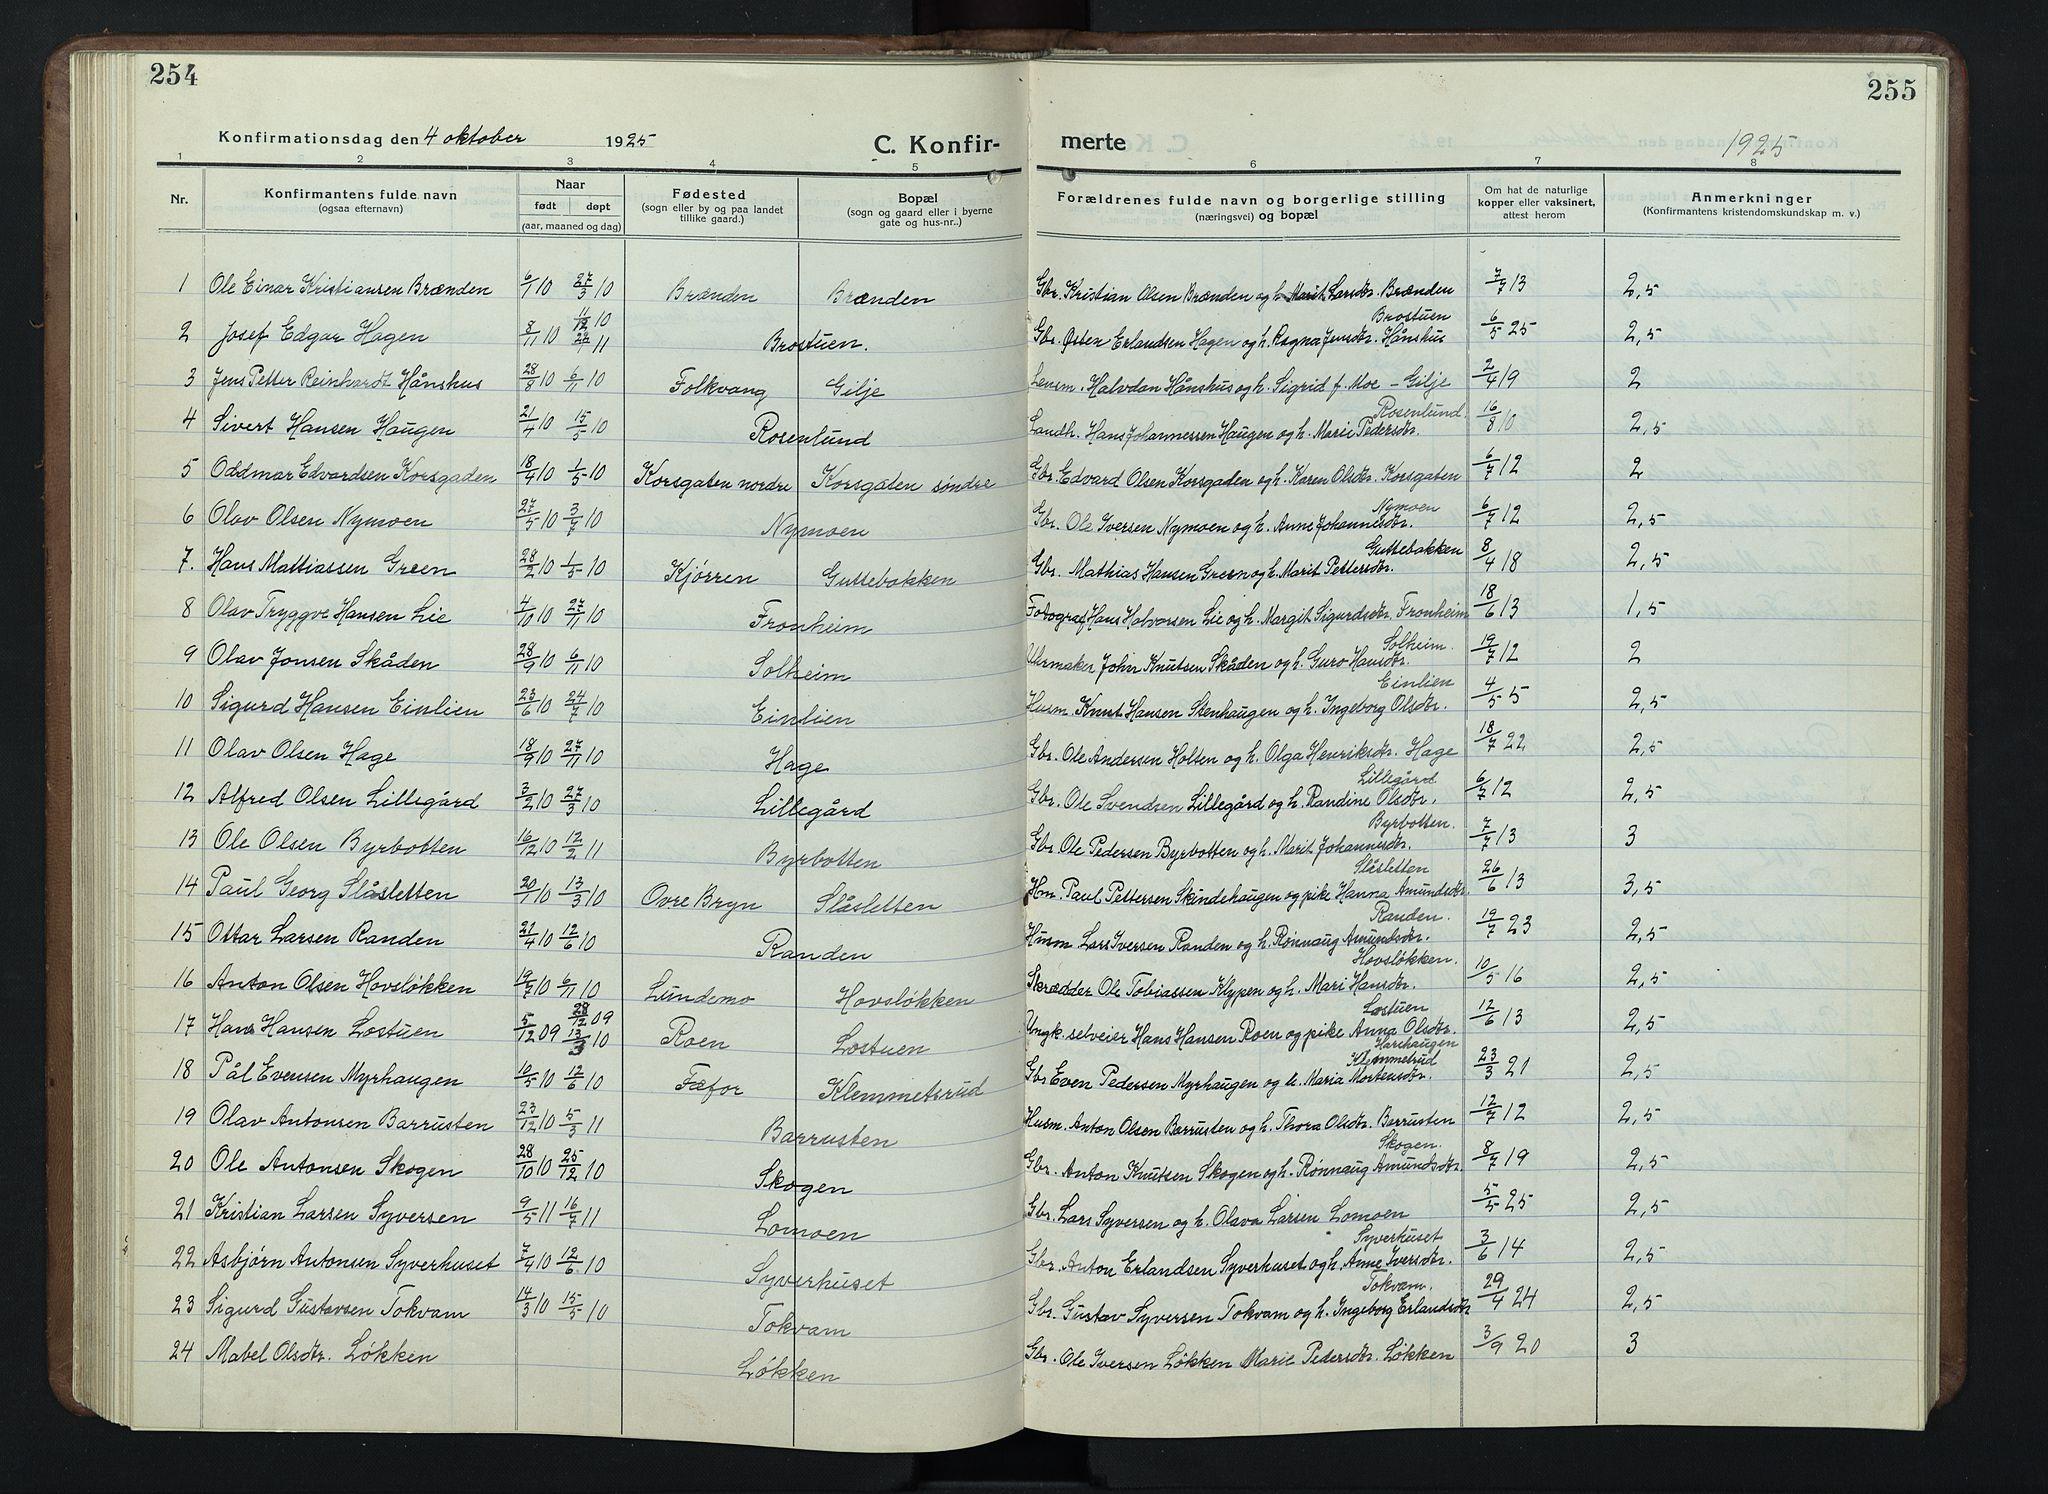 SAH, Nord-Fron prestekontor, Klokkerbok nr. 7, 1915-1946, s. 254-255